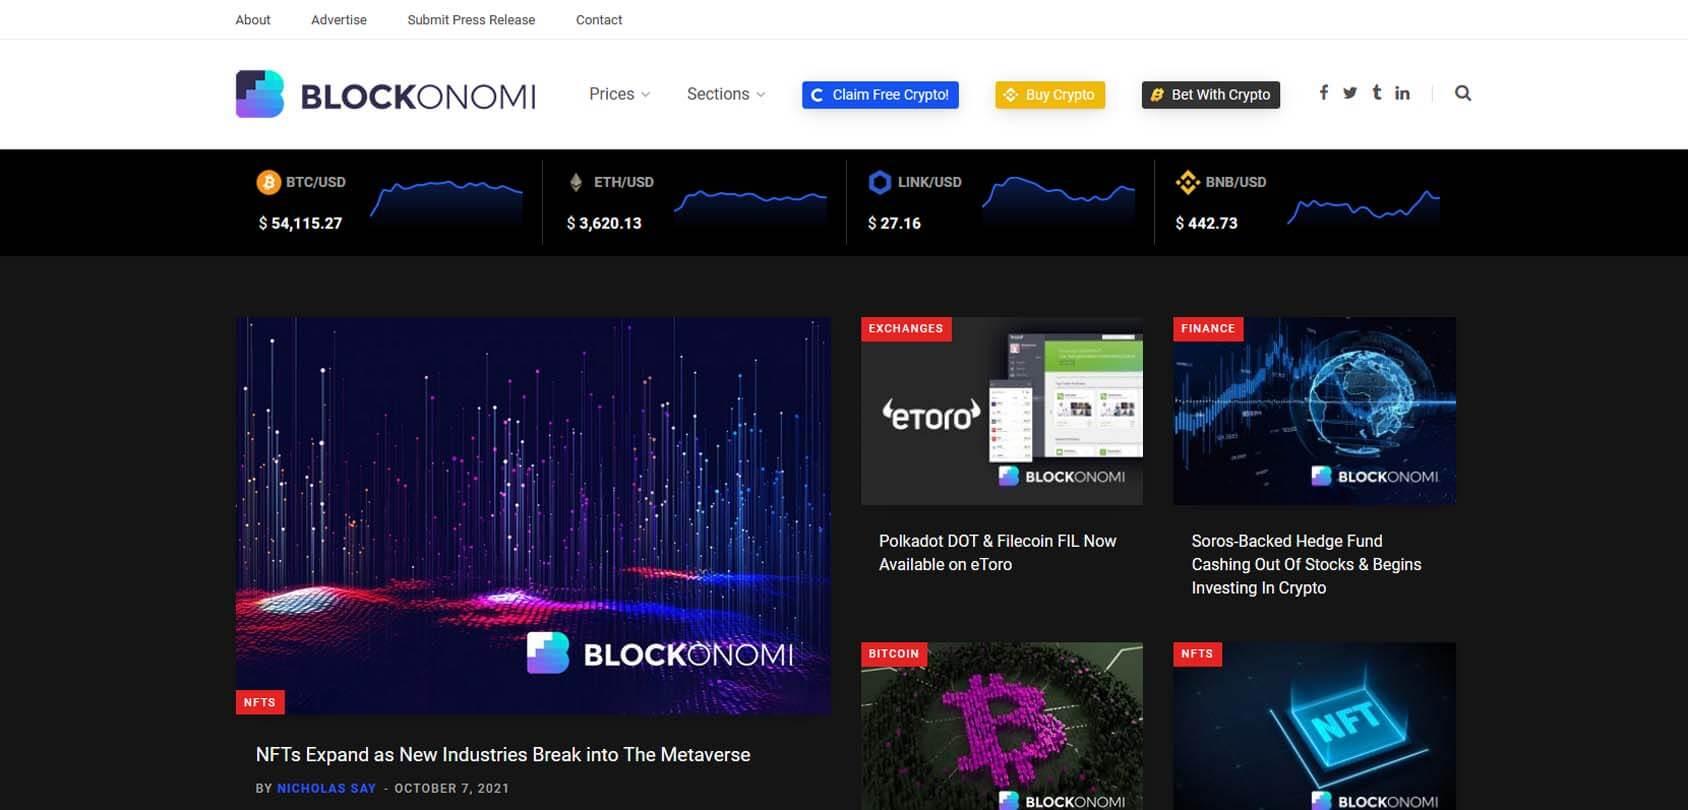 Blockonomi Homepage